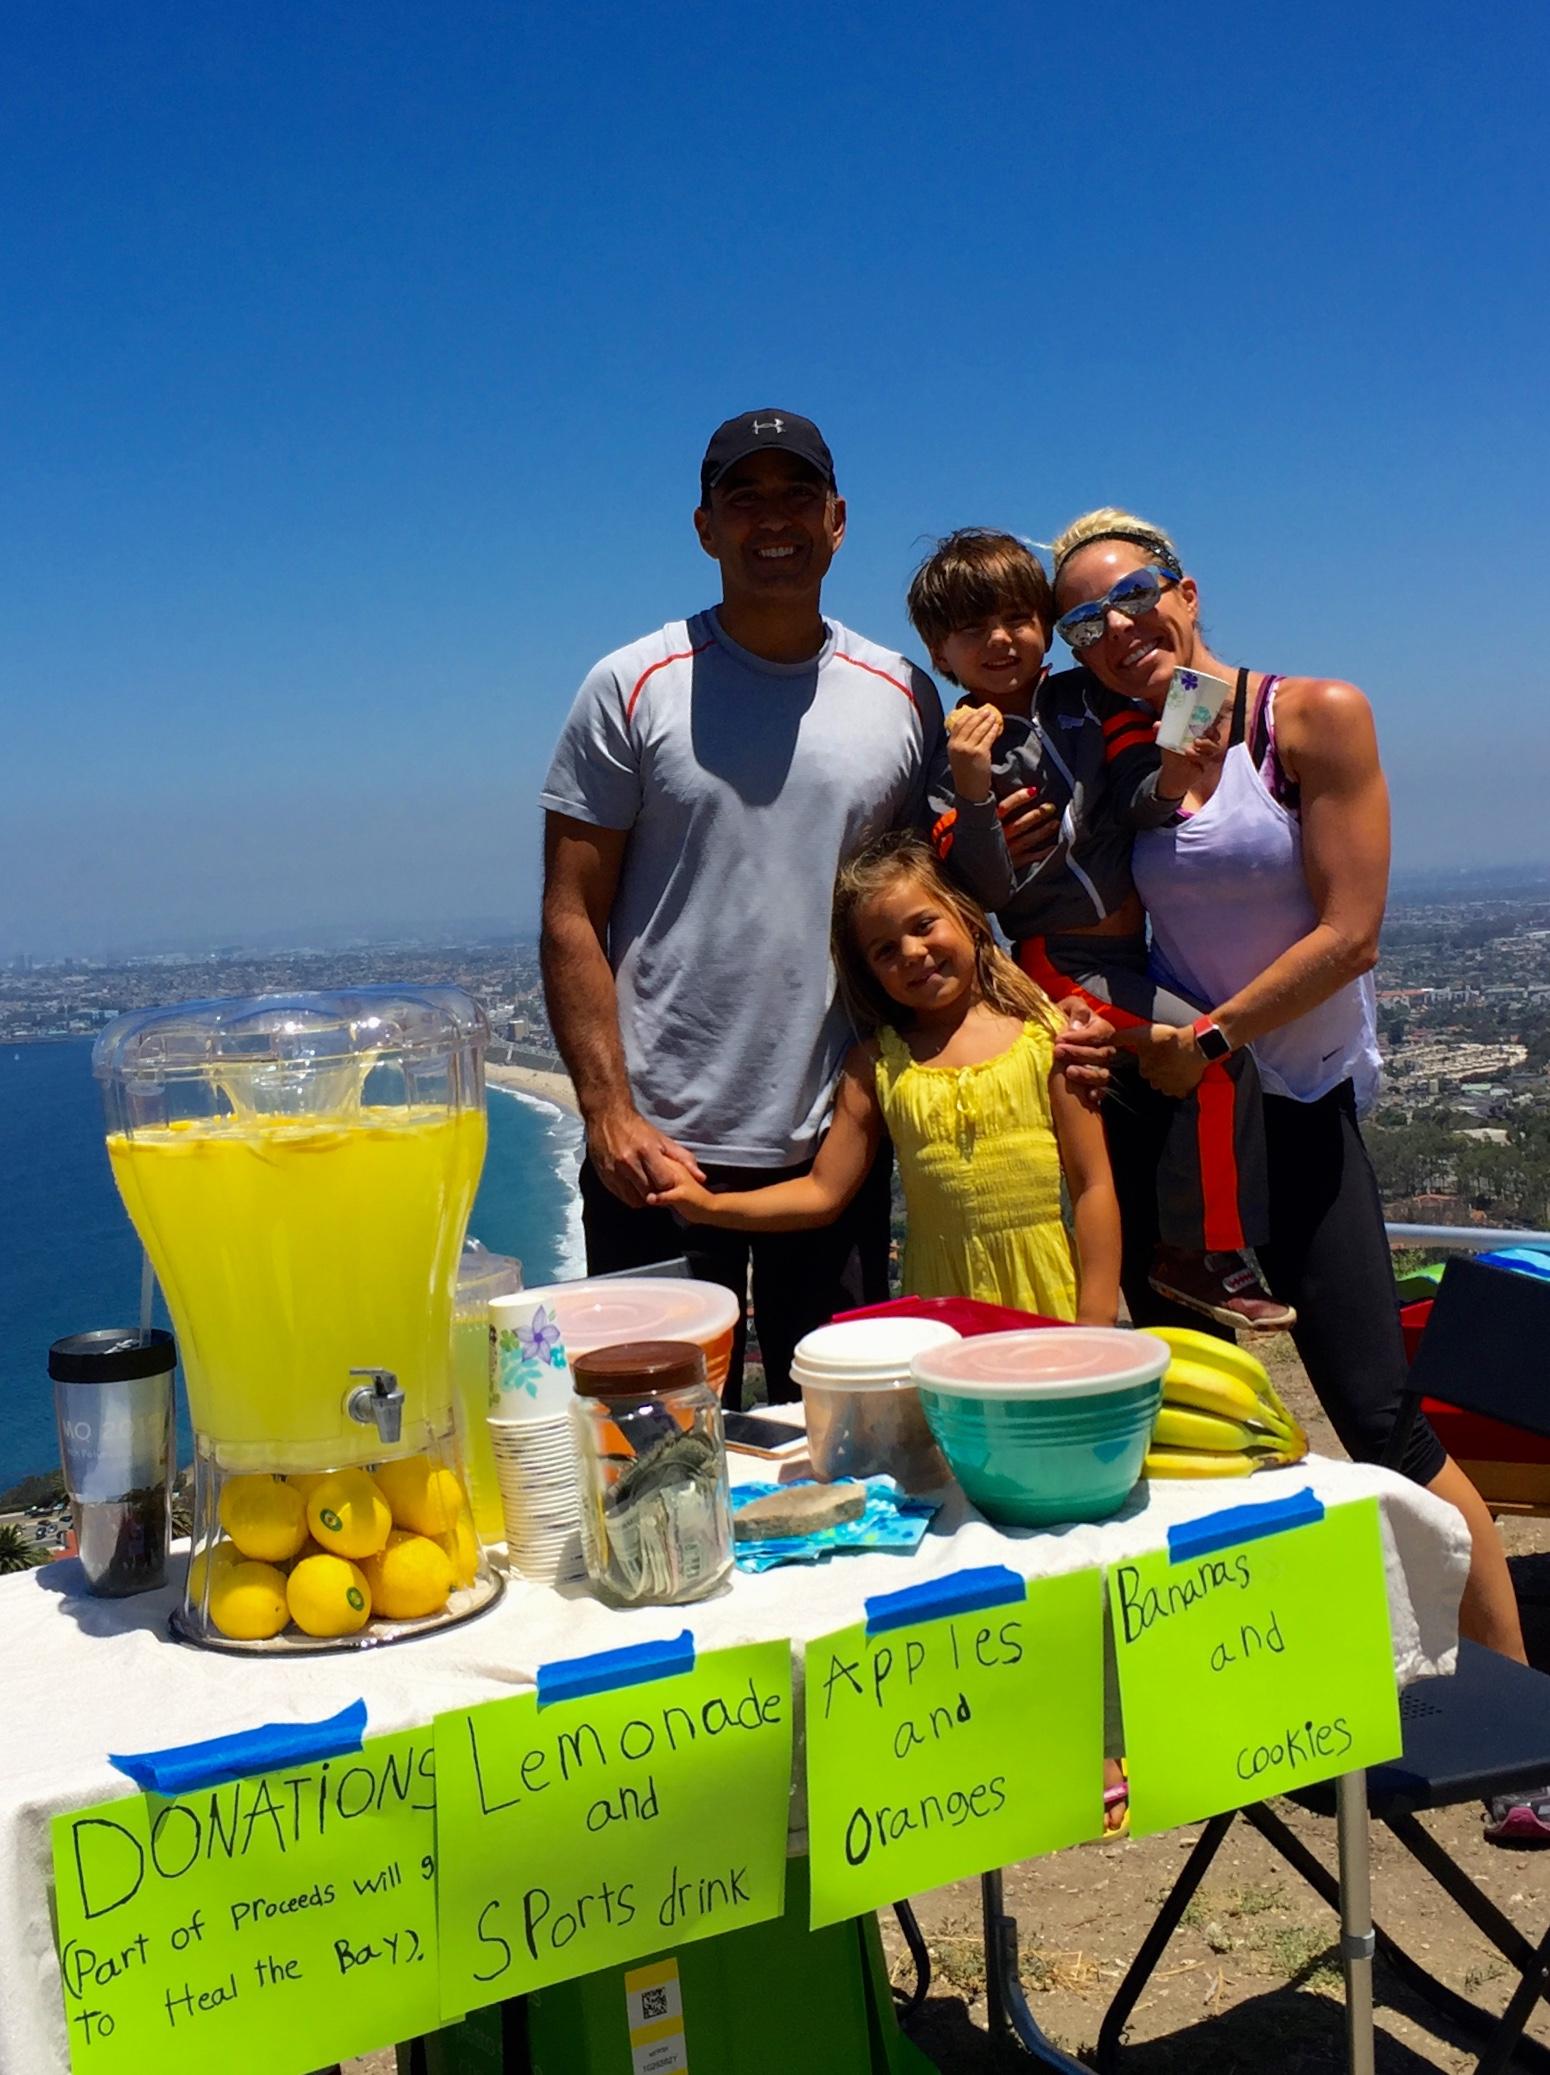 Lemonade sales